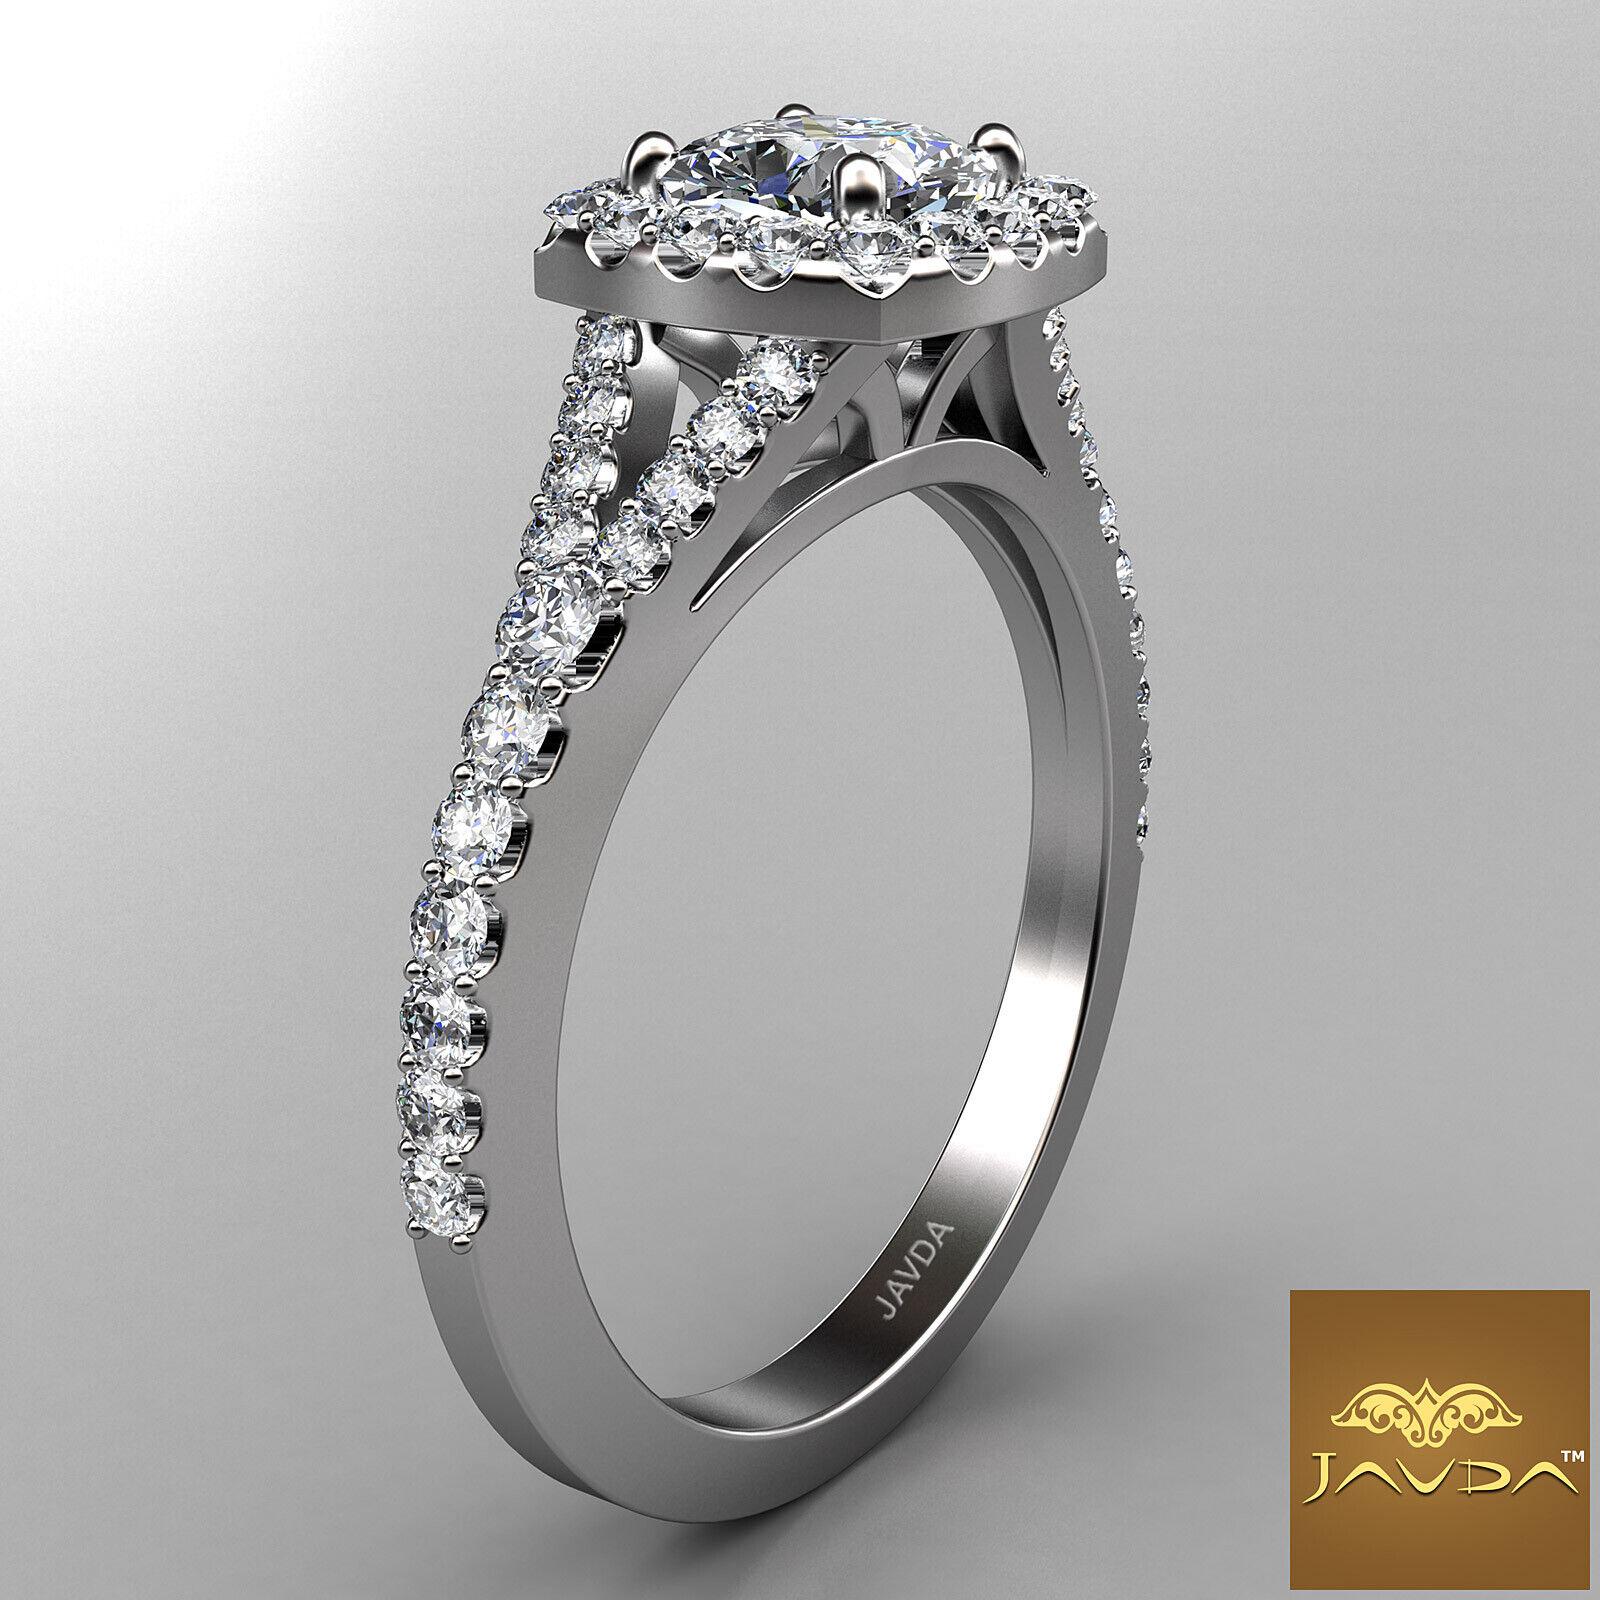 Cushion Shape Diamond Engagement GIA G VVS2 Halo Pre-Set Ring 18k White Gold 1Ct 2